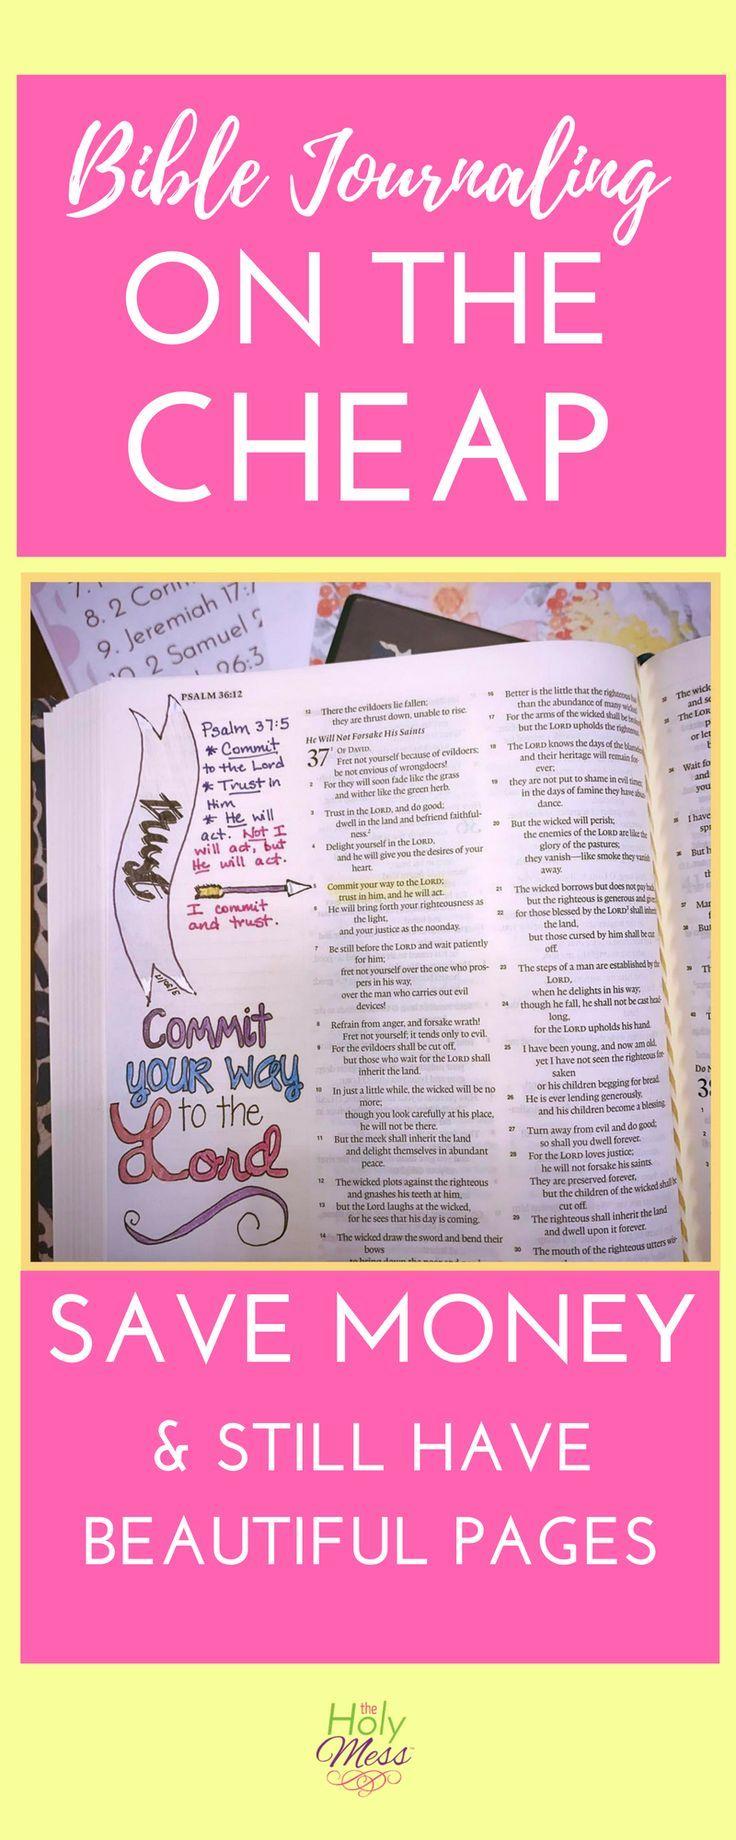 Bible Journaling|Journal|Prayer|DIY|Money Saving|Tips|Life Hacks|Coupons